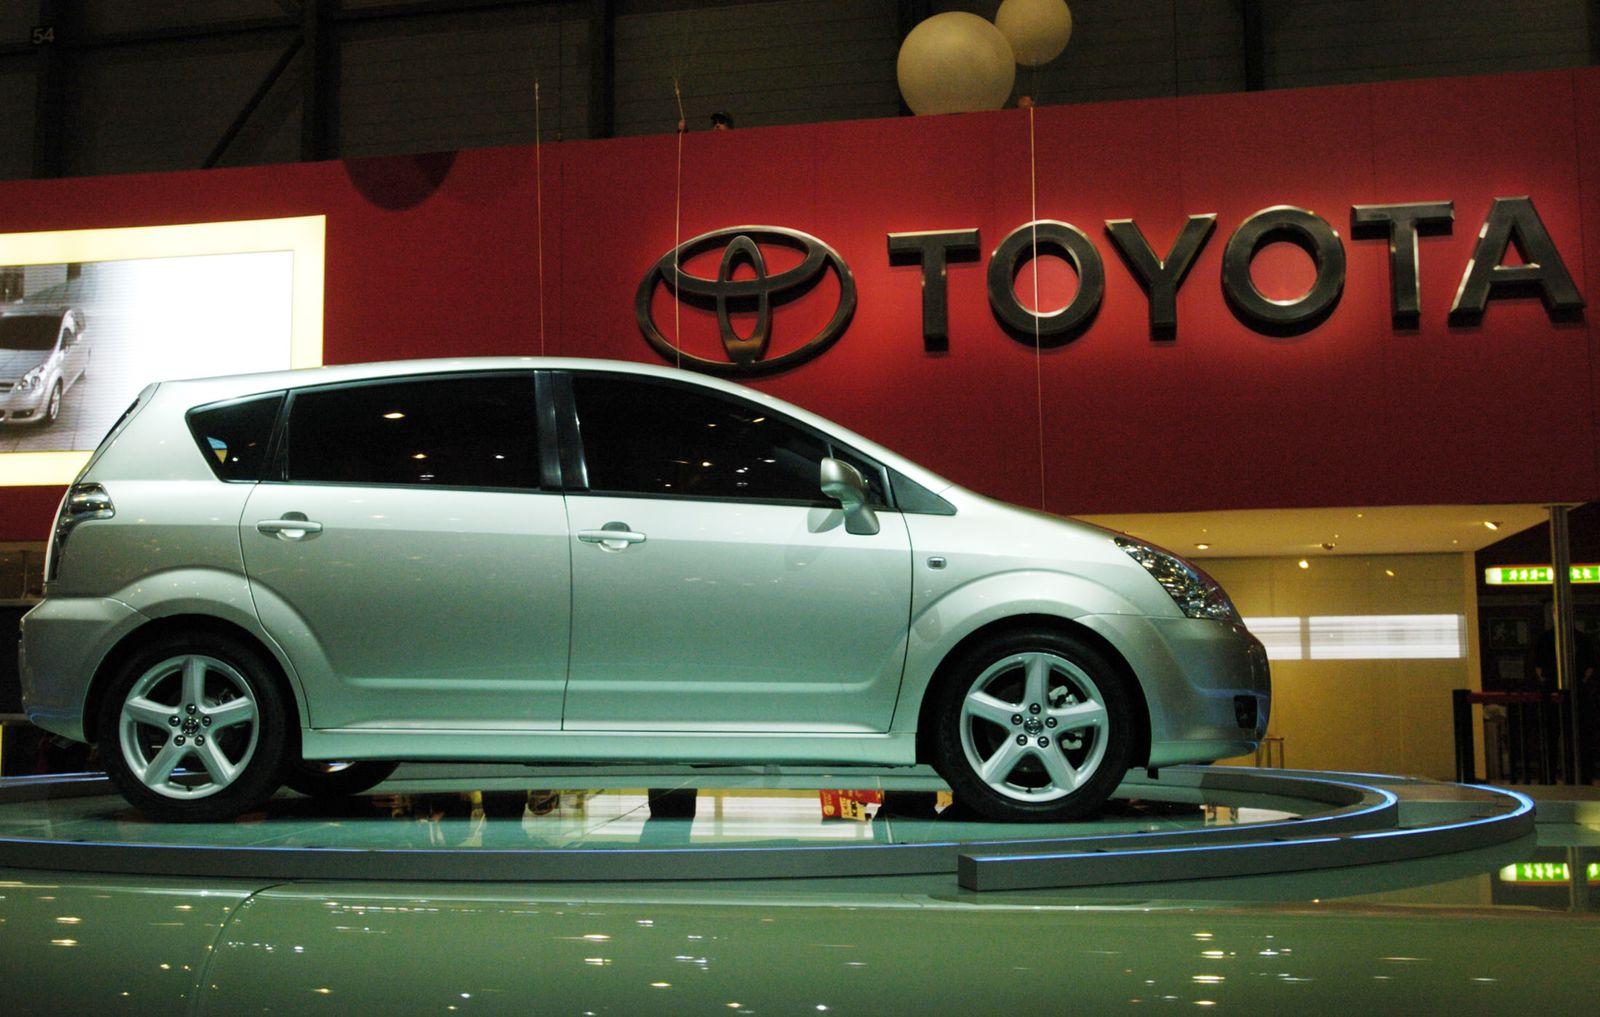 TÜV Report 2013 / Baujahr 2005 / Toyota Corolla Verso